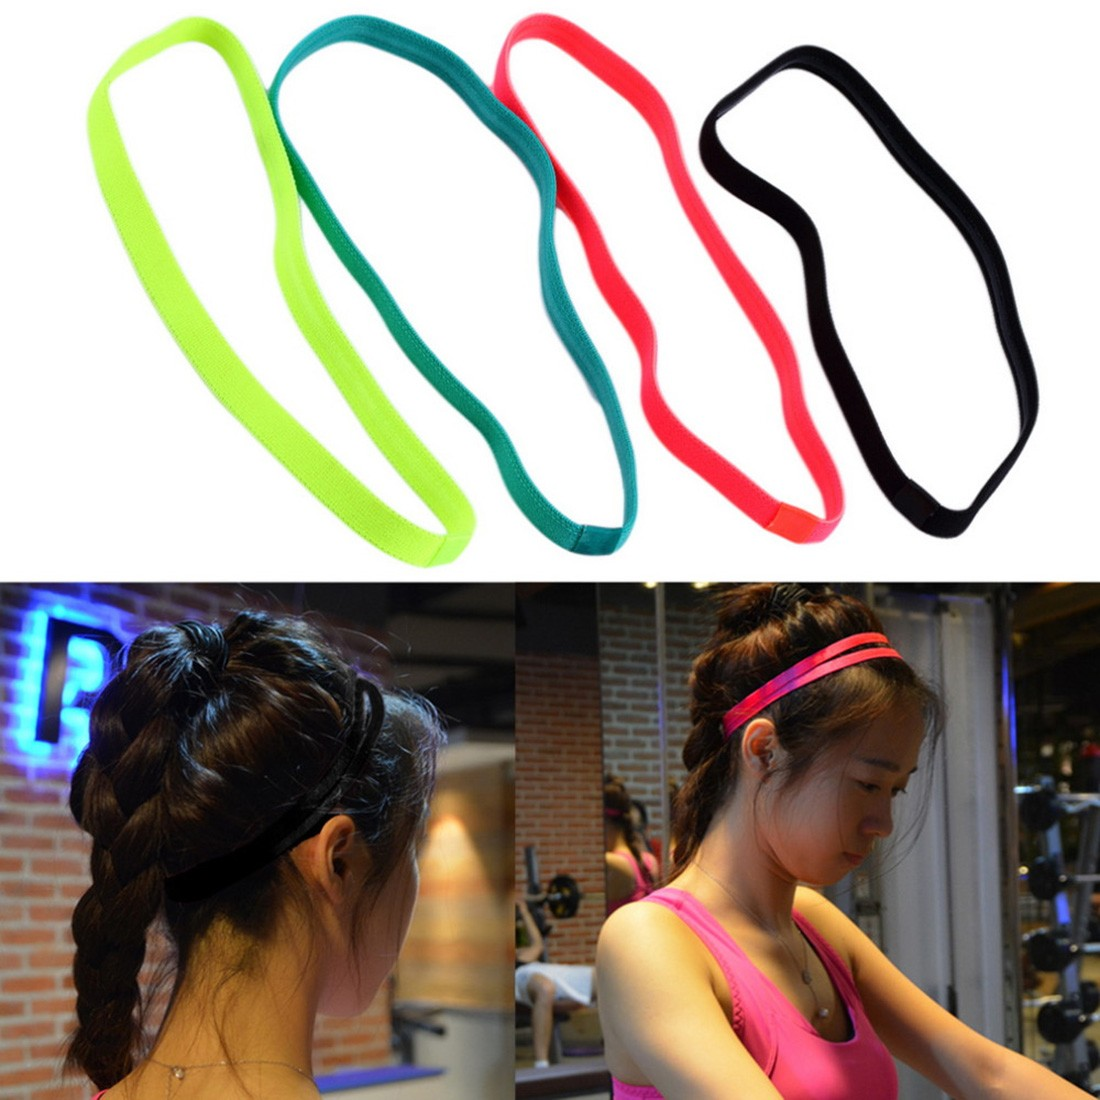 Women Men Yoga Hair Bands Sports Headband Sport Anti-slip Elastic Rubber Sweatband Football Yoga Running Band Yoga Accessories